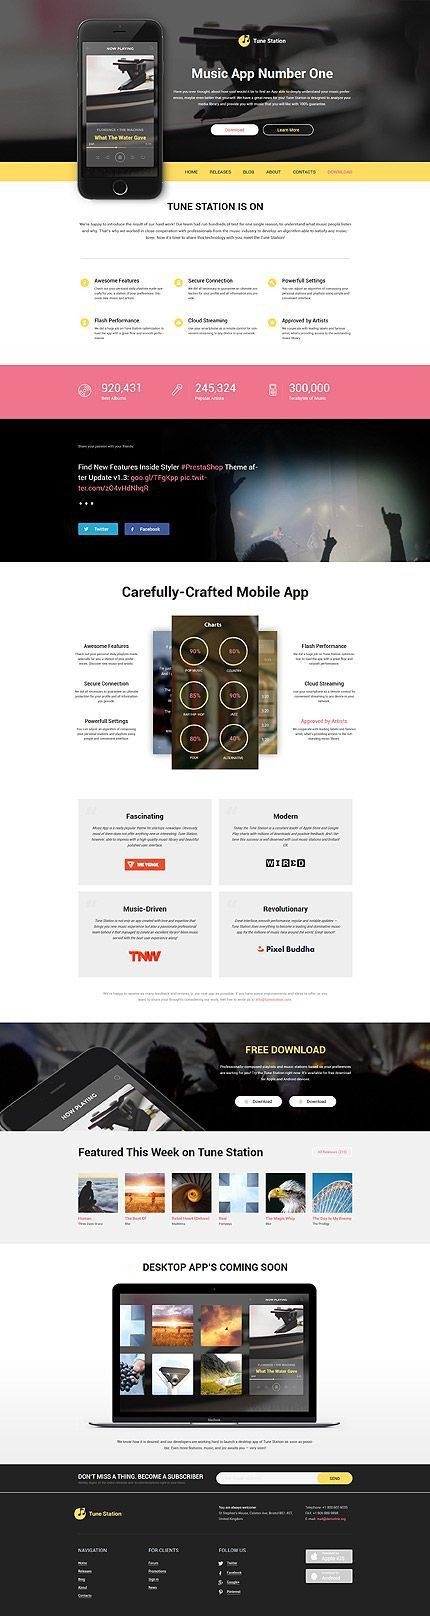 16 best Software Website Templates images on Pinterest | Website ...